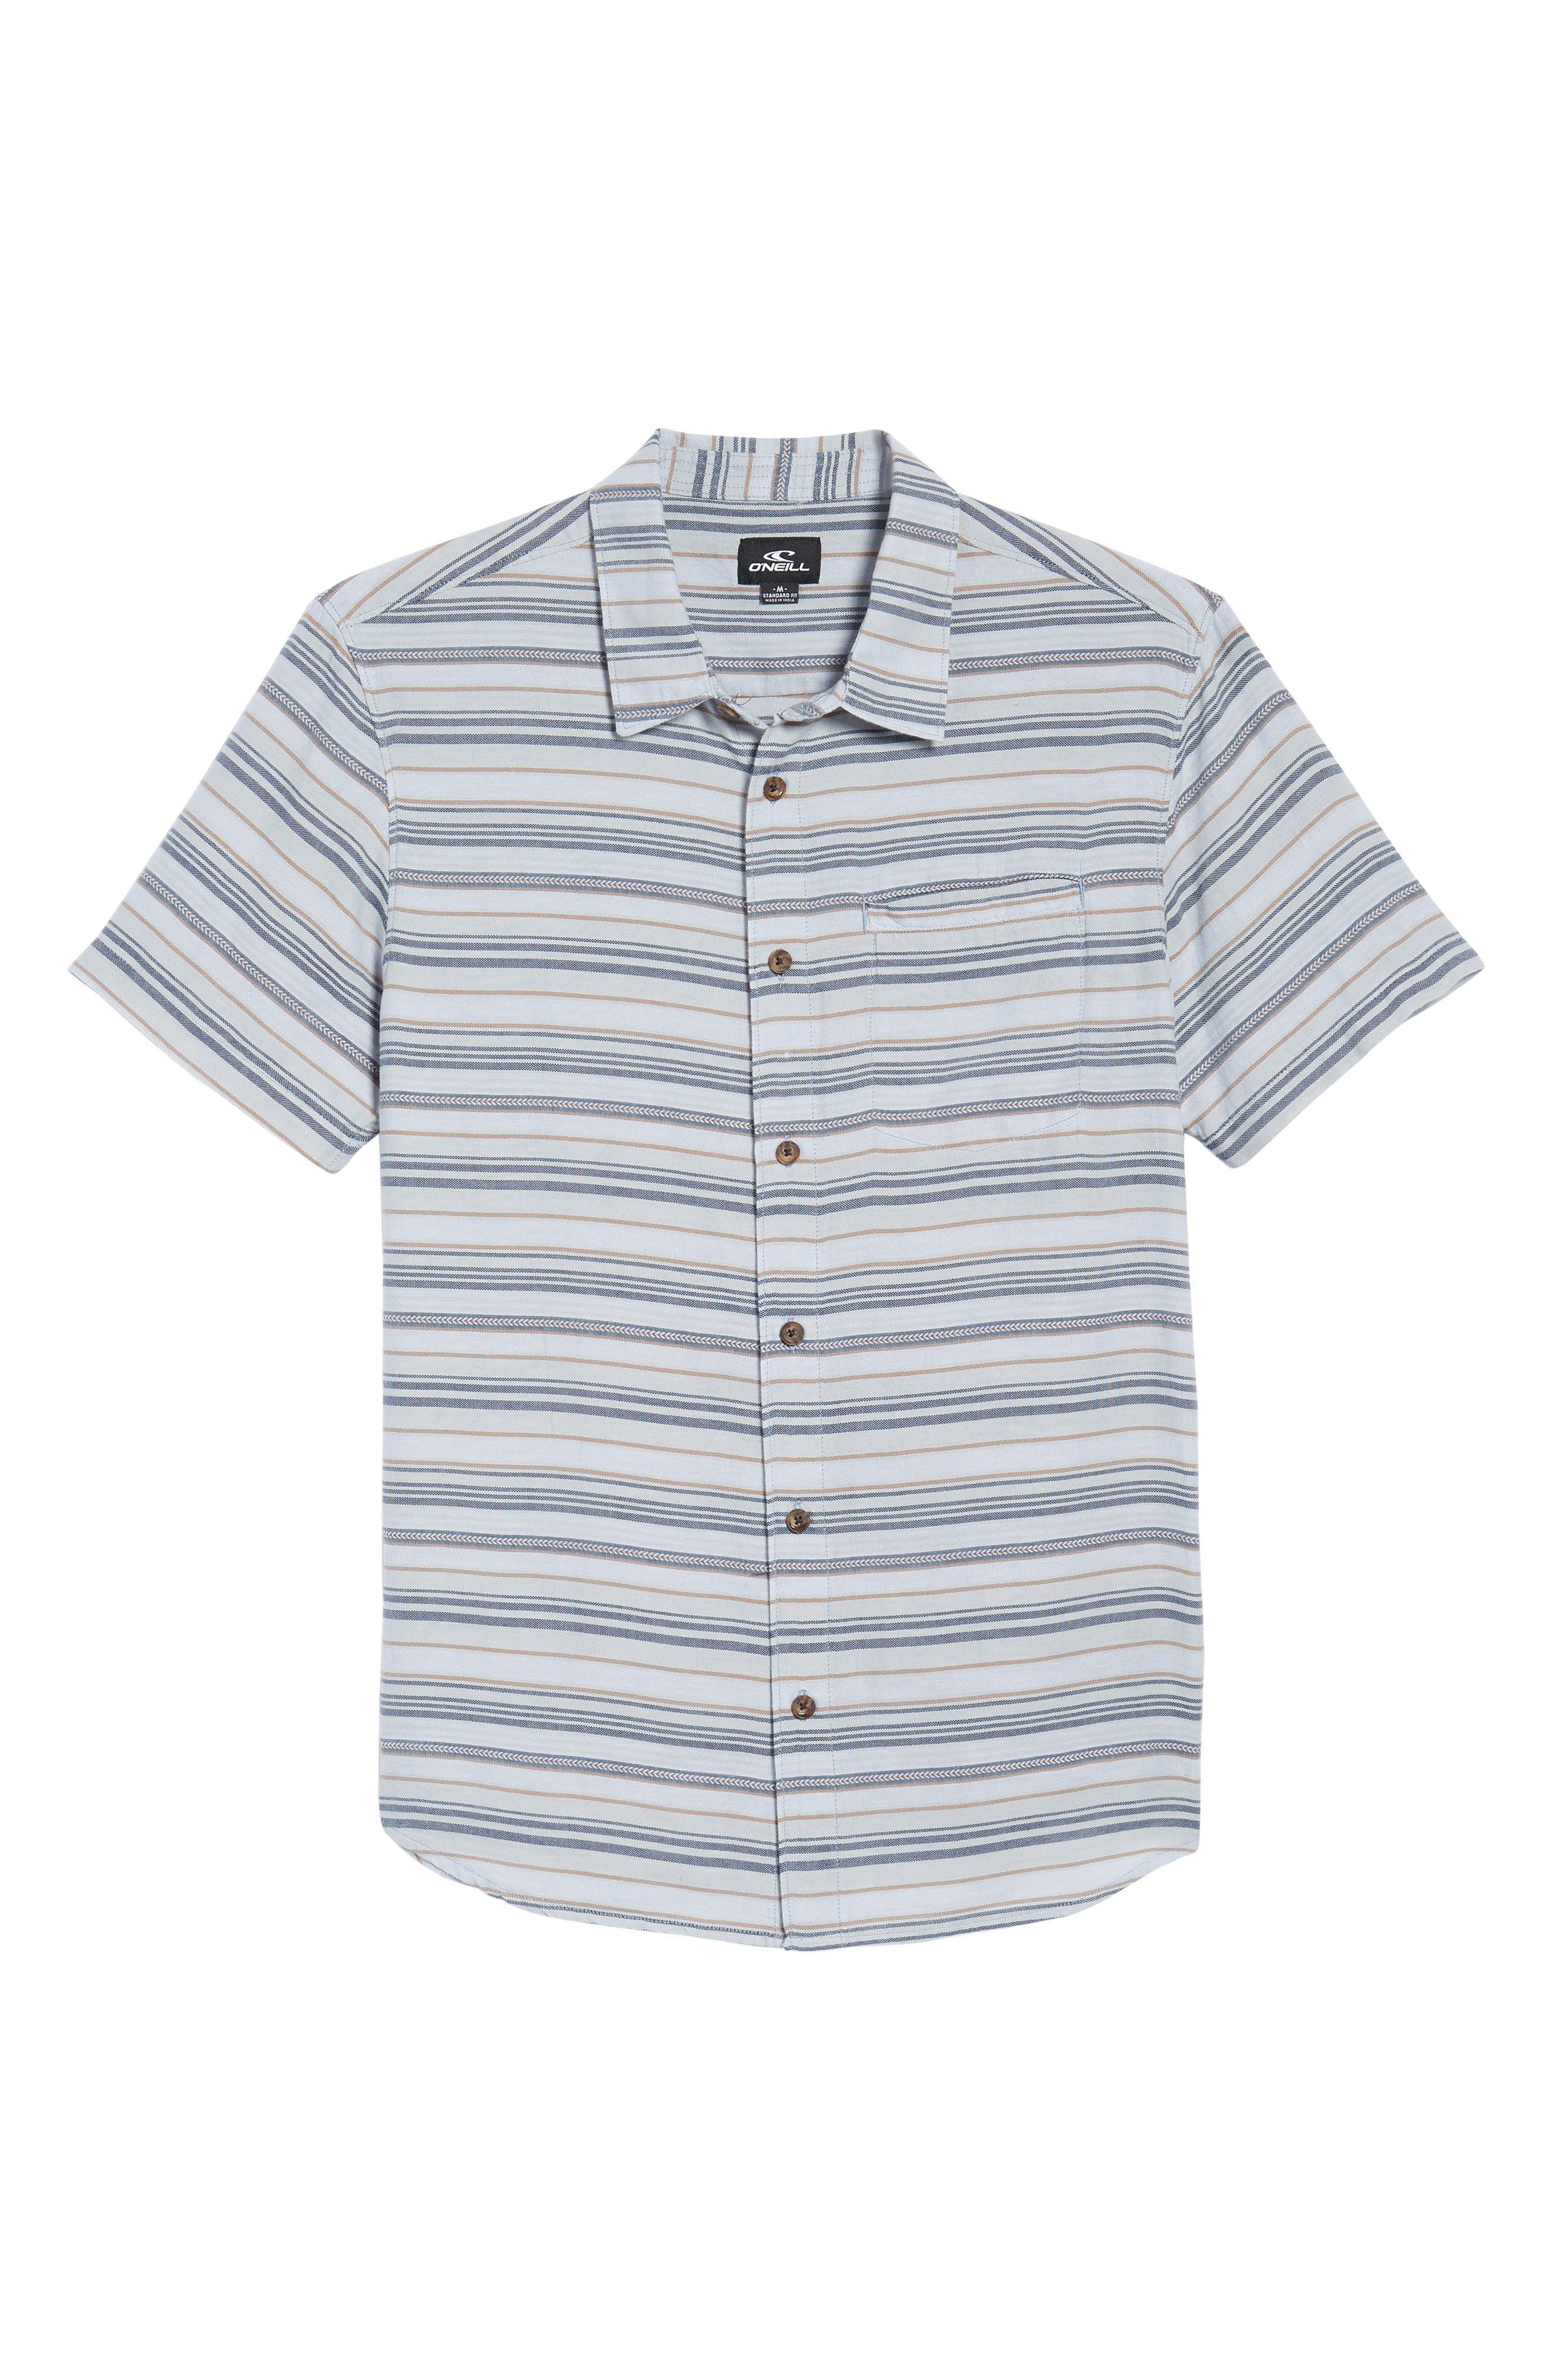 Currington Short Sleeve Shirt,                             Alternate thumbnail 6, color,                             Light Blue